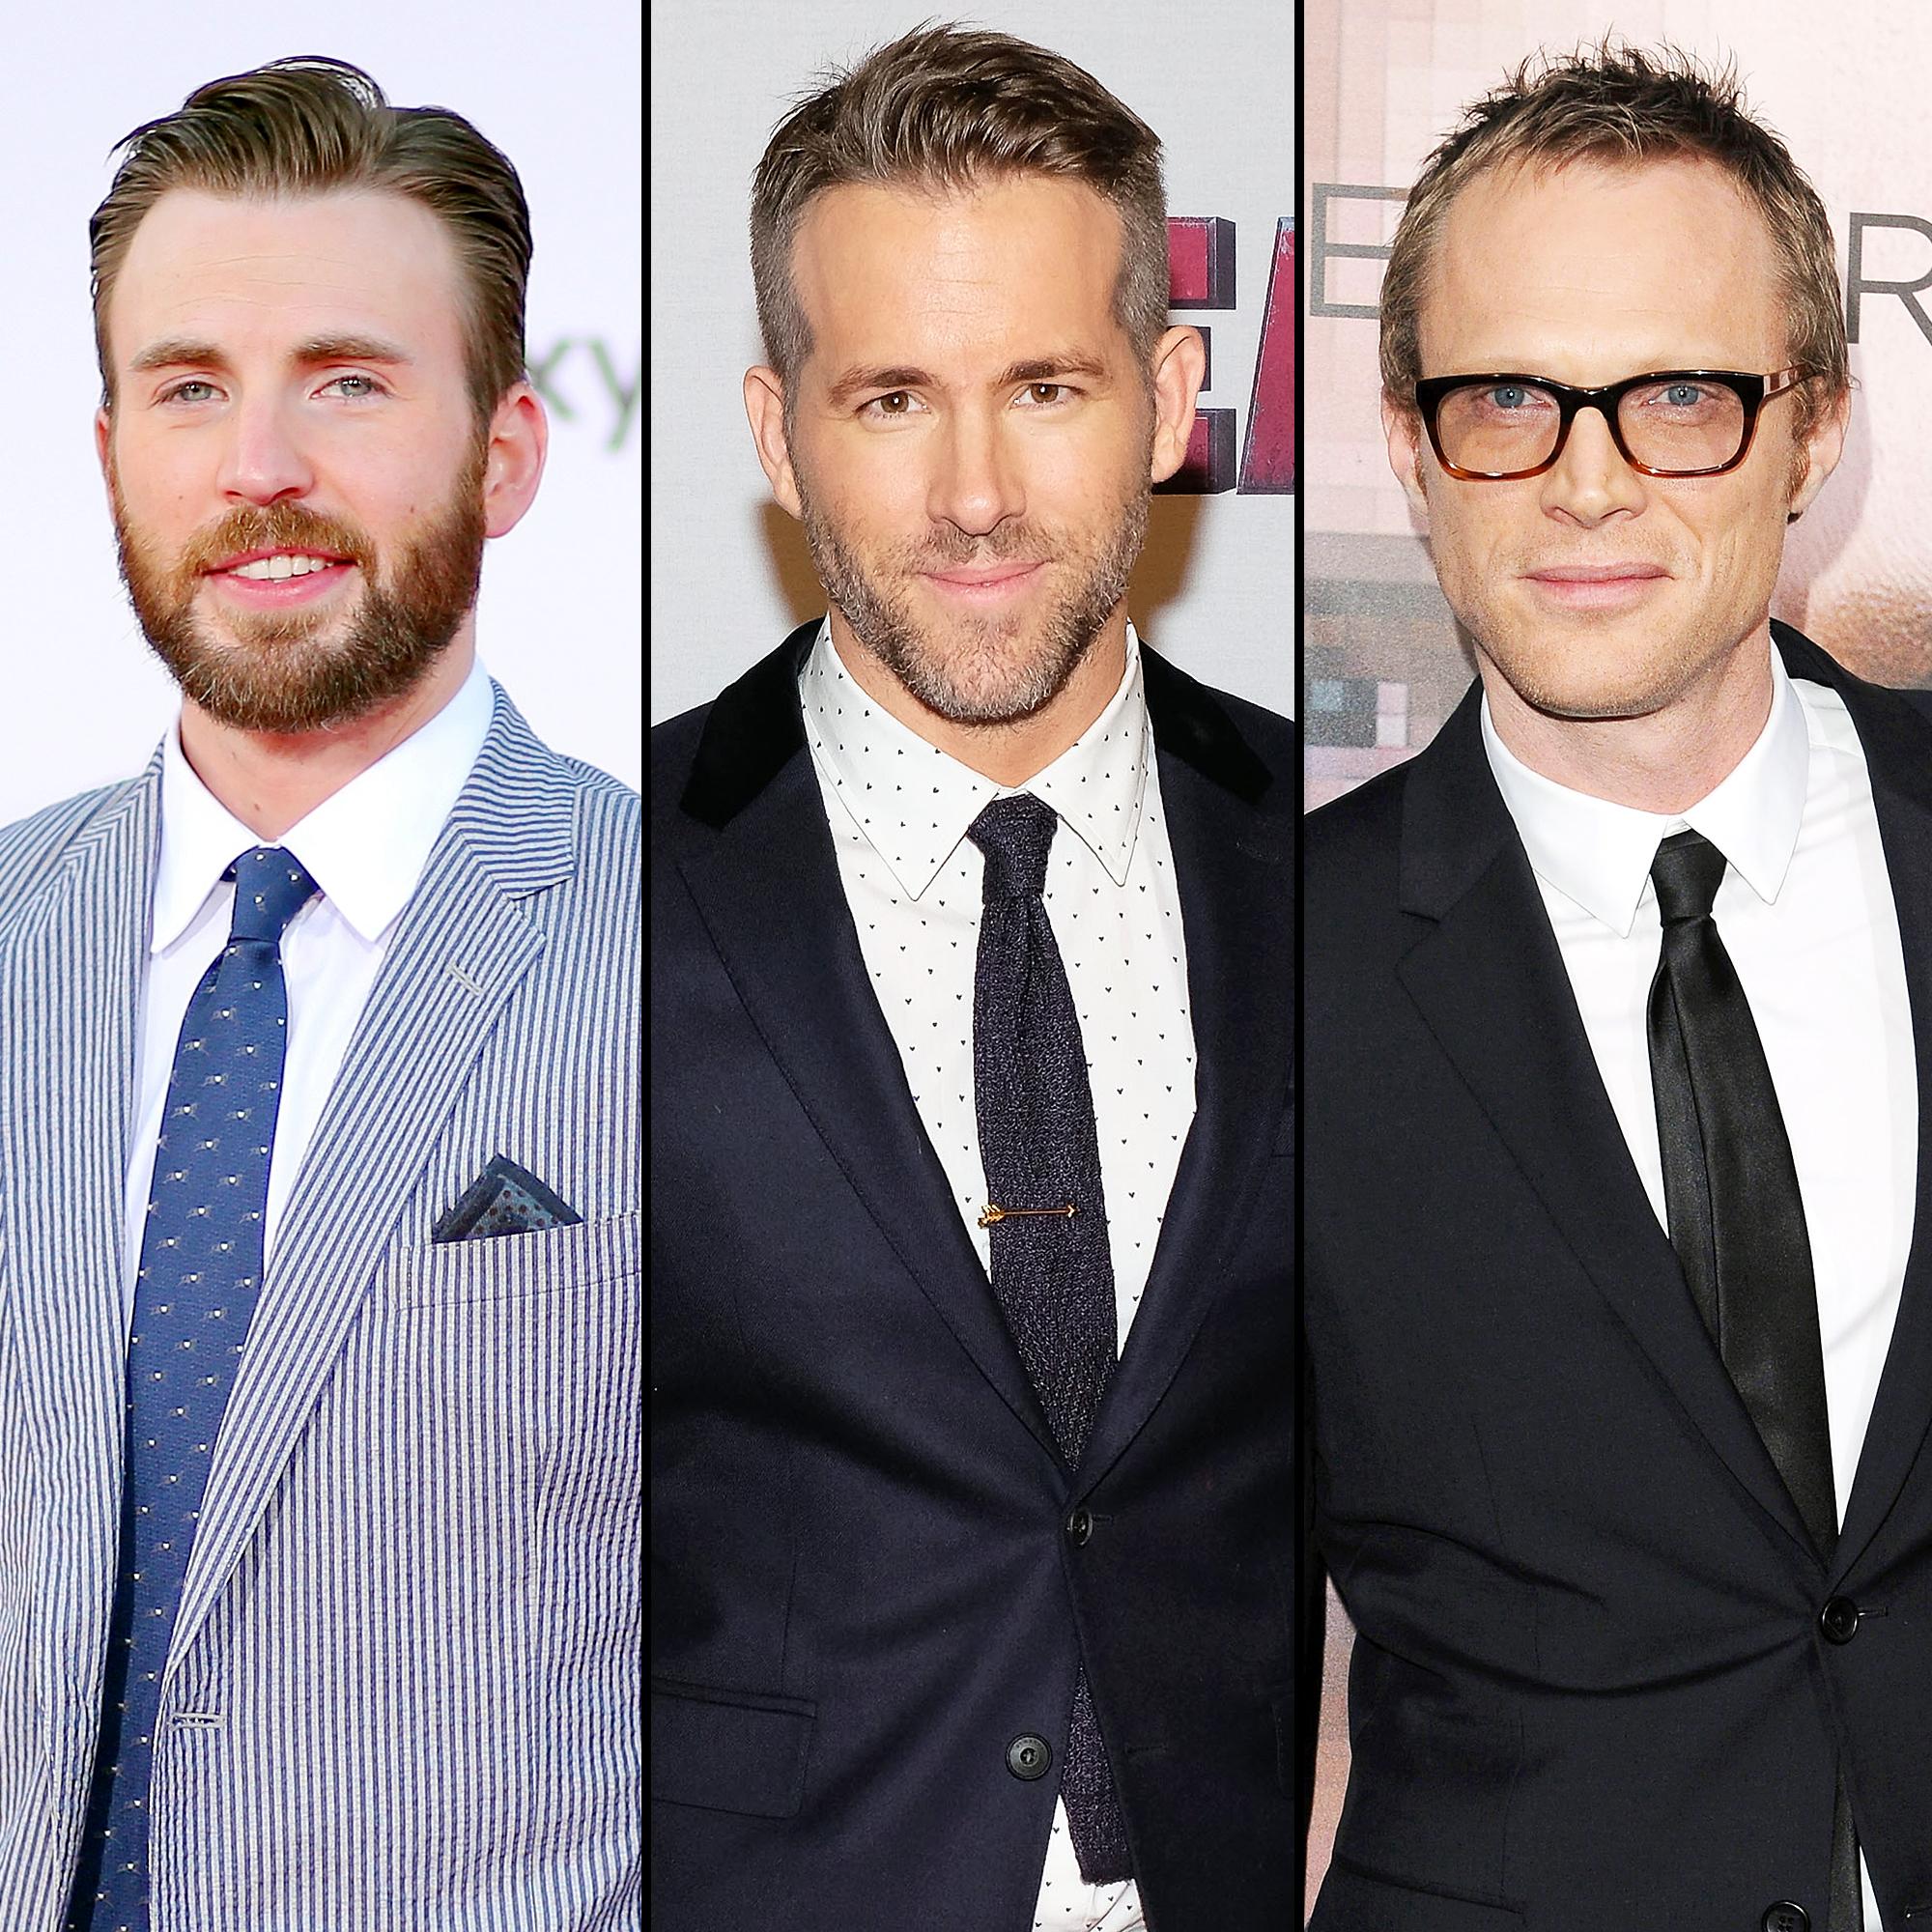 Chris Evans Ryan Reynolds Make Dying Boys Avengers Wish Come True